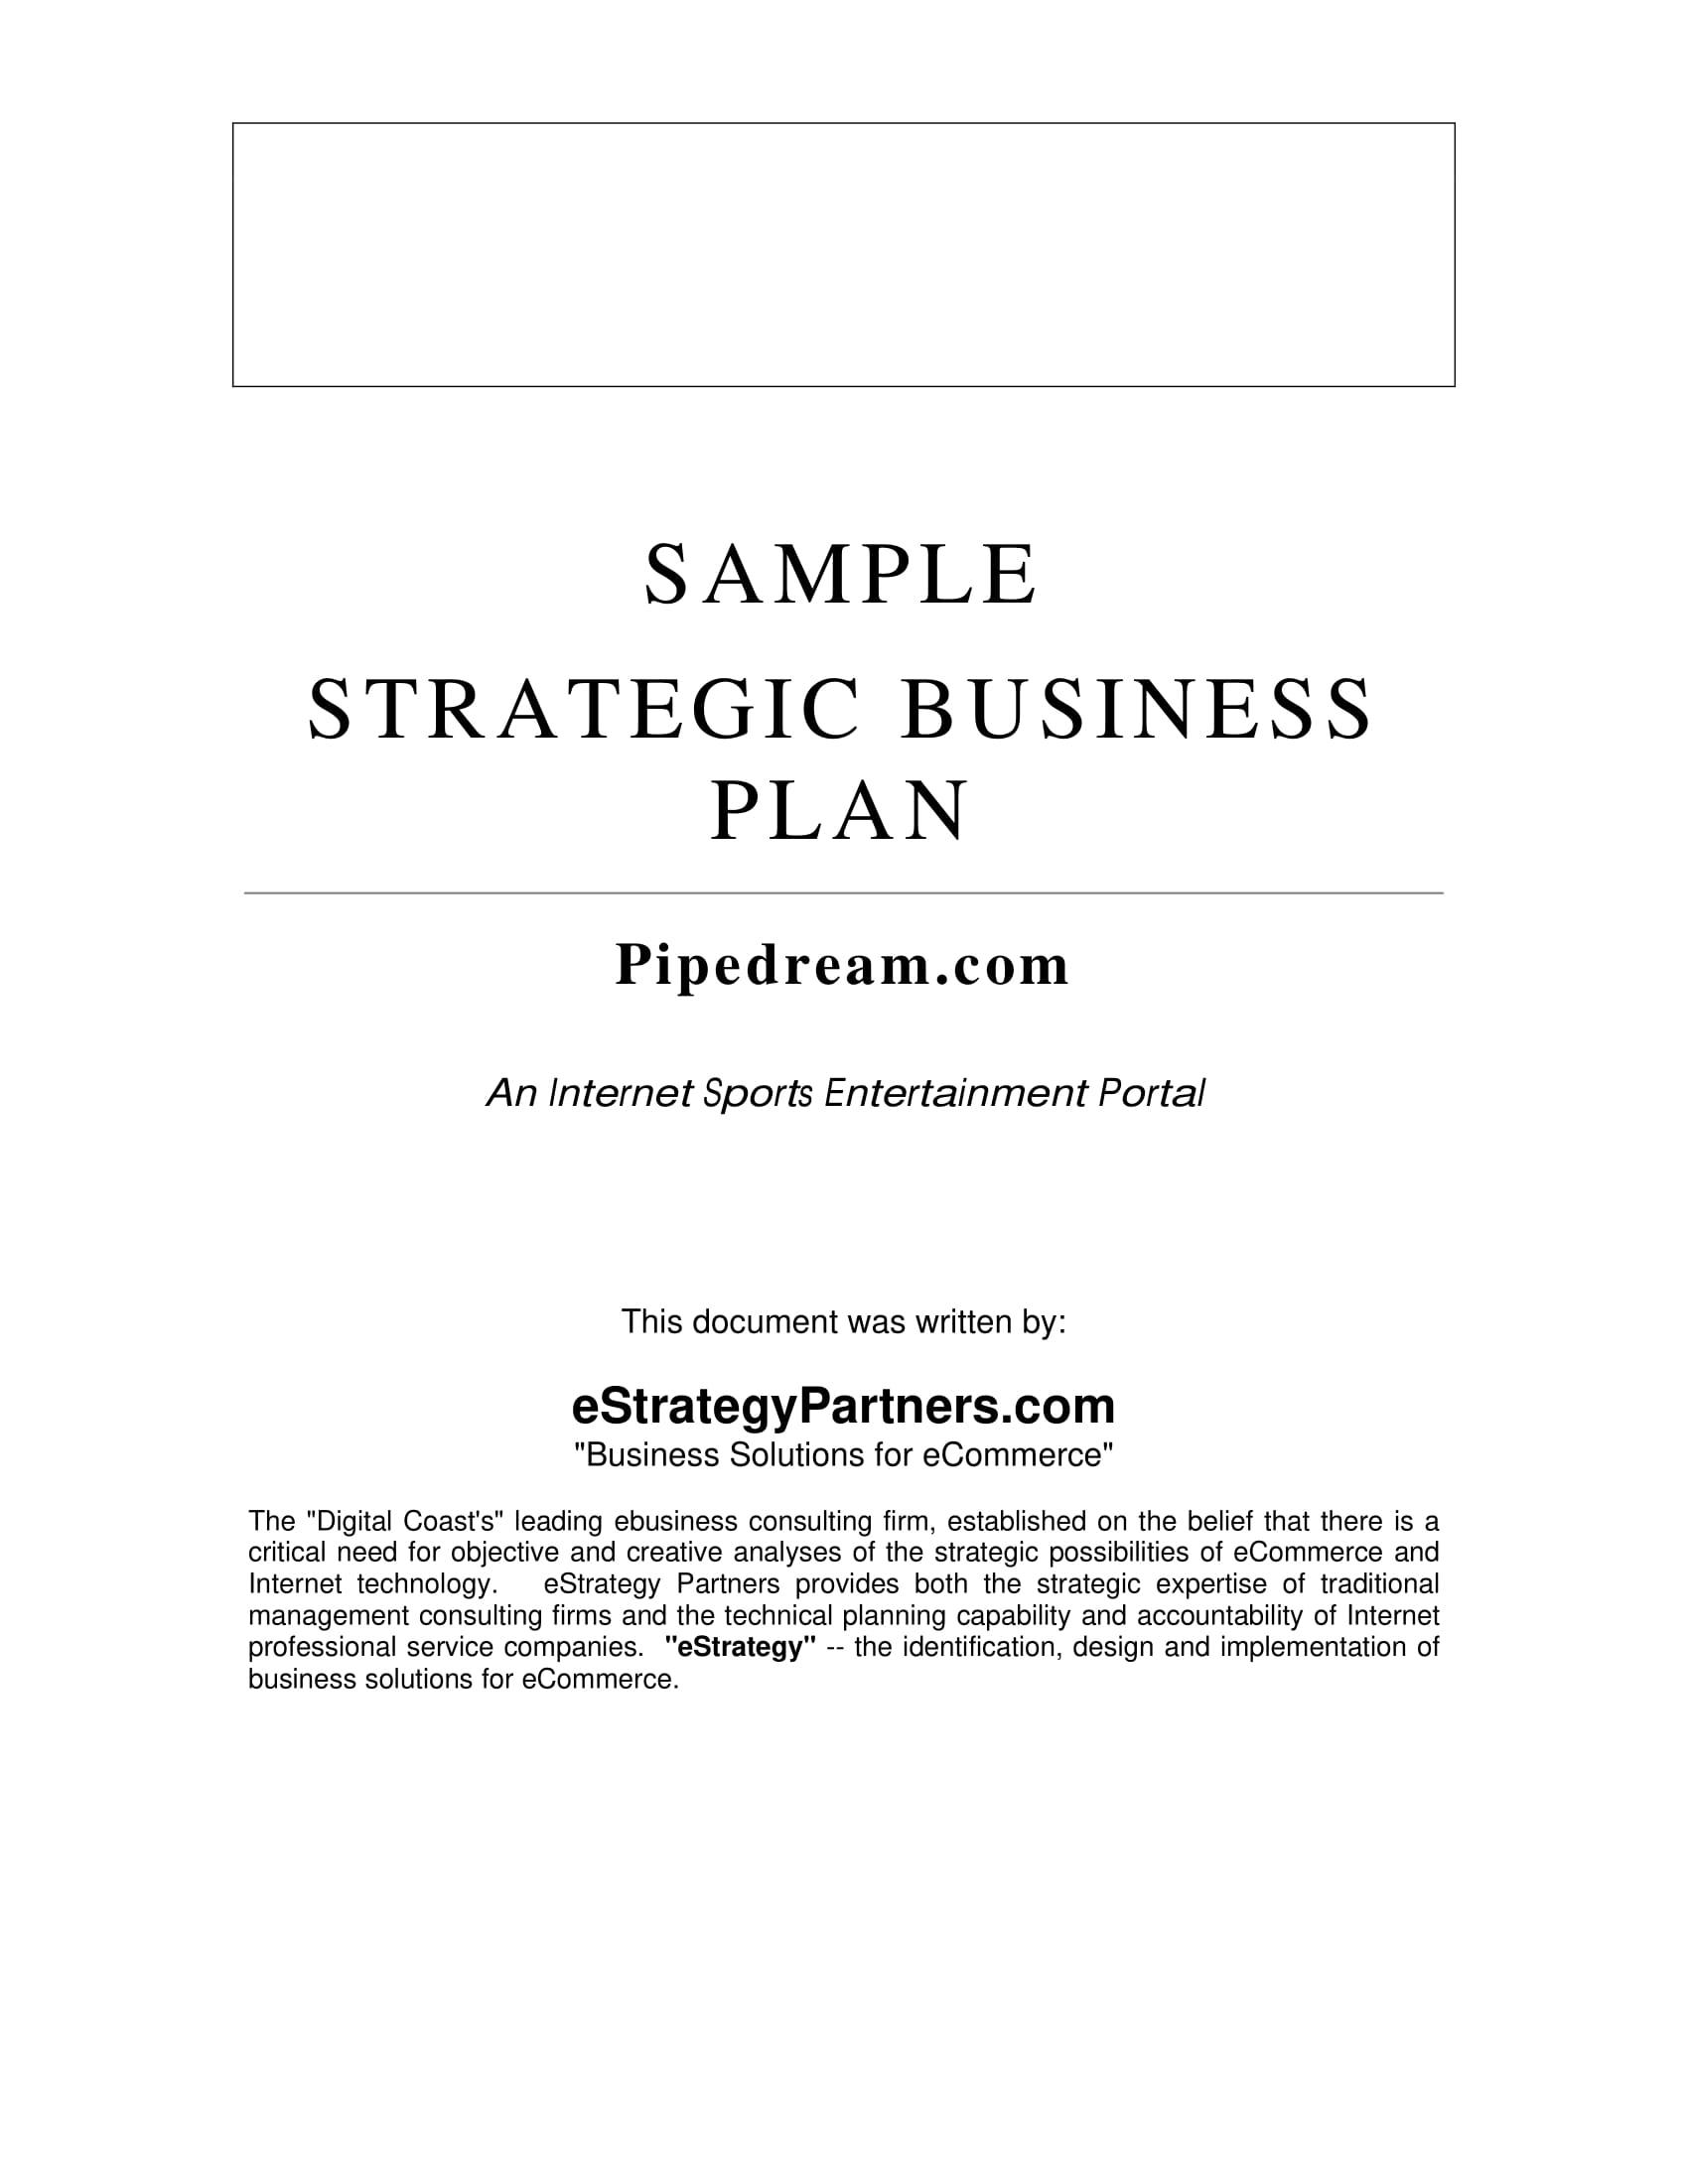 9 strategic marketing plan examples pdf